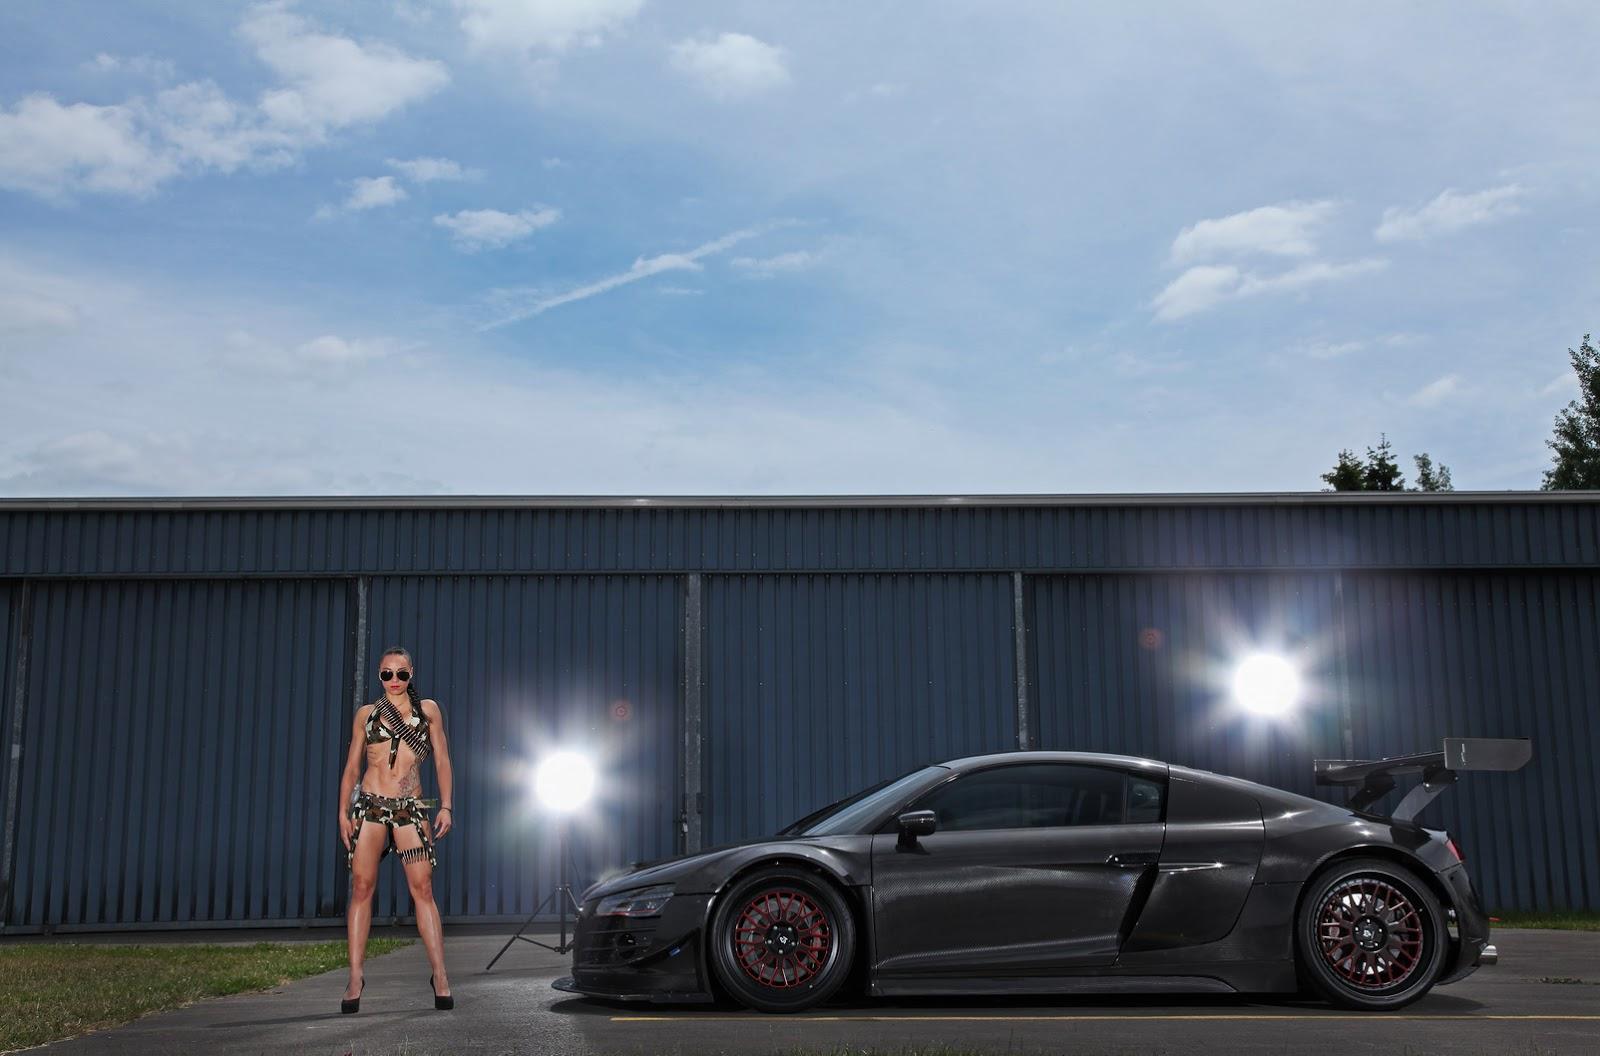 Audi-R8-Recon-MR8-6.jpg